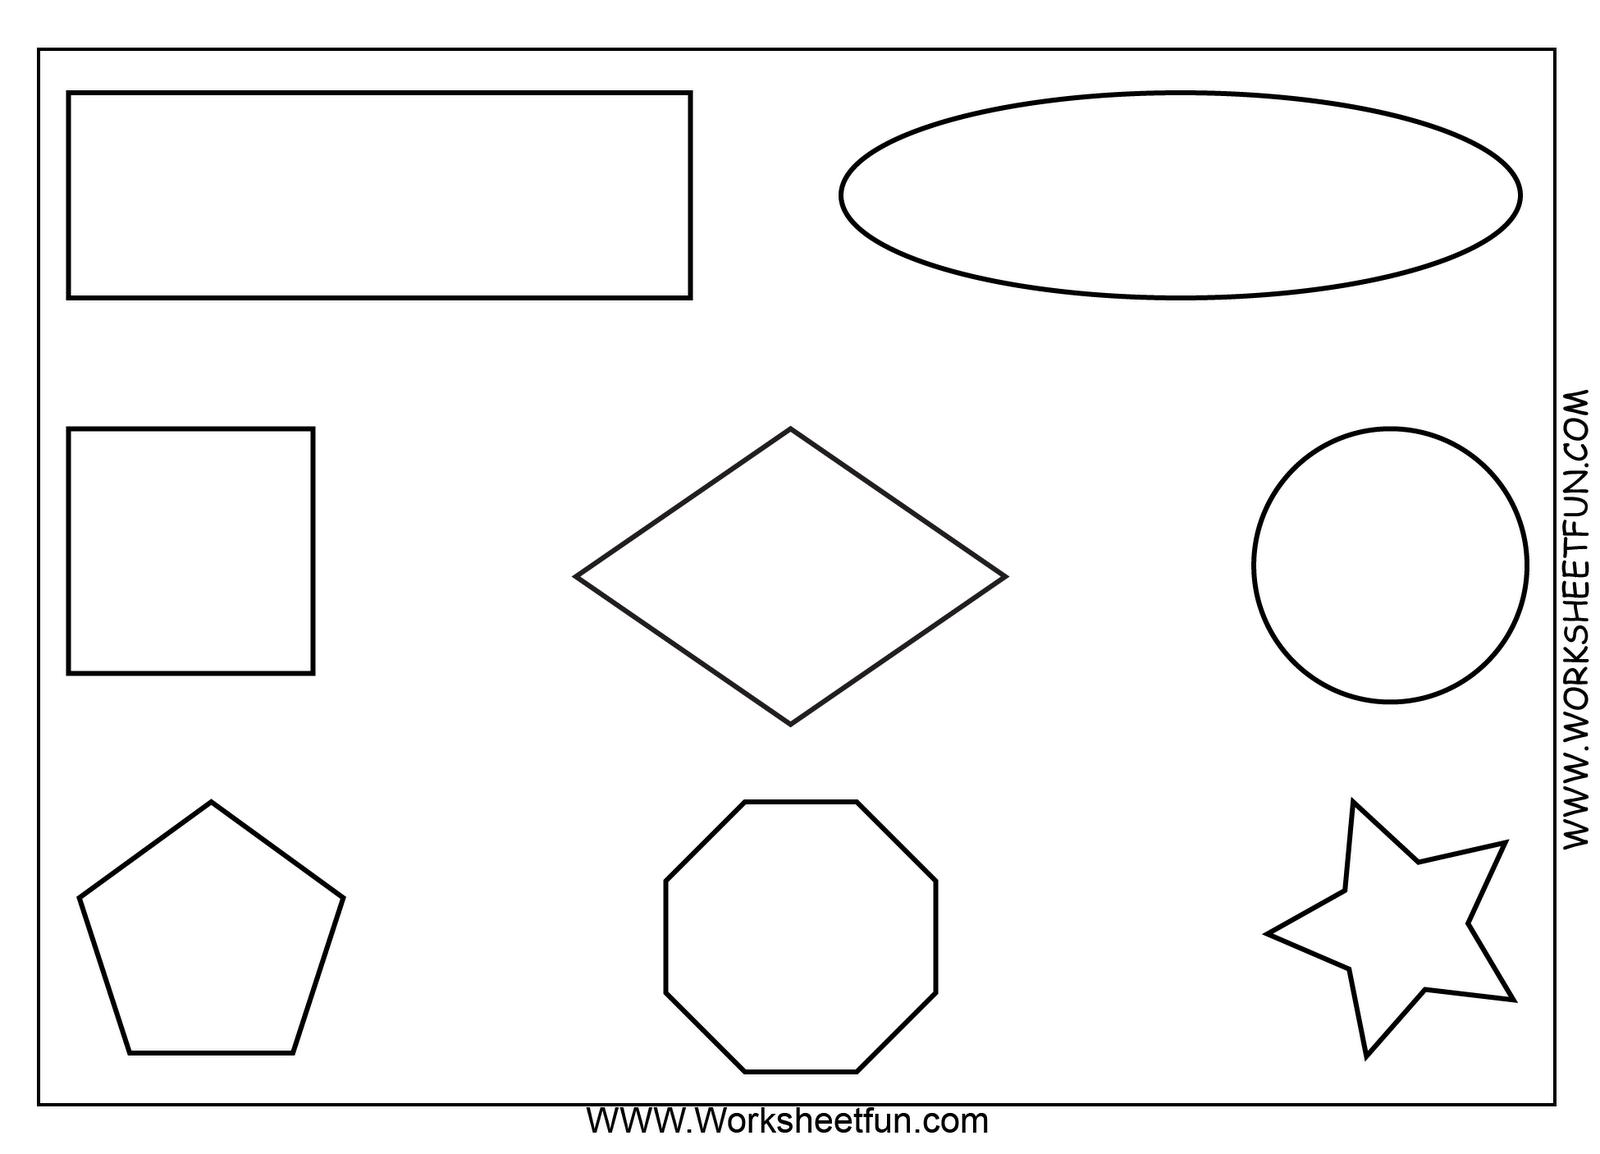 worksheet Free Shape Worksheets free printable preschool shape worksheets worksheet blog shapes 2017 calendar